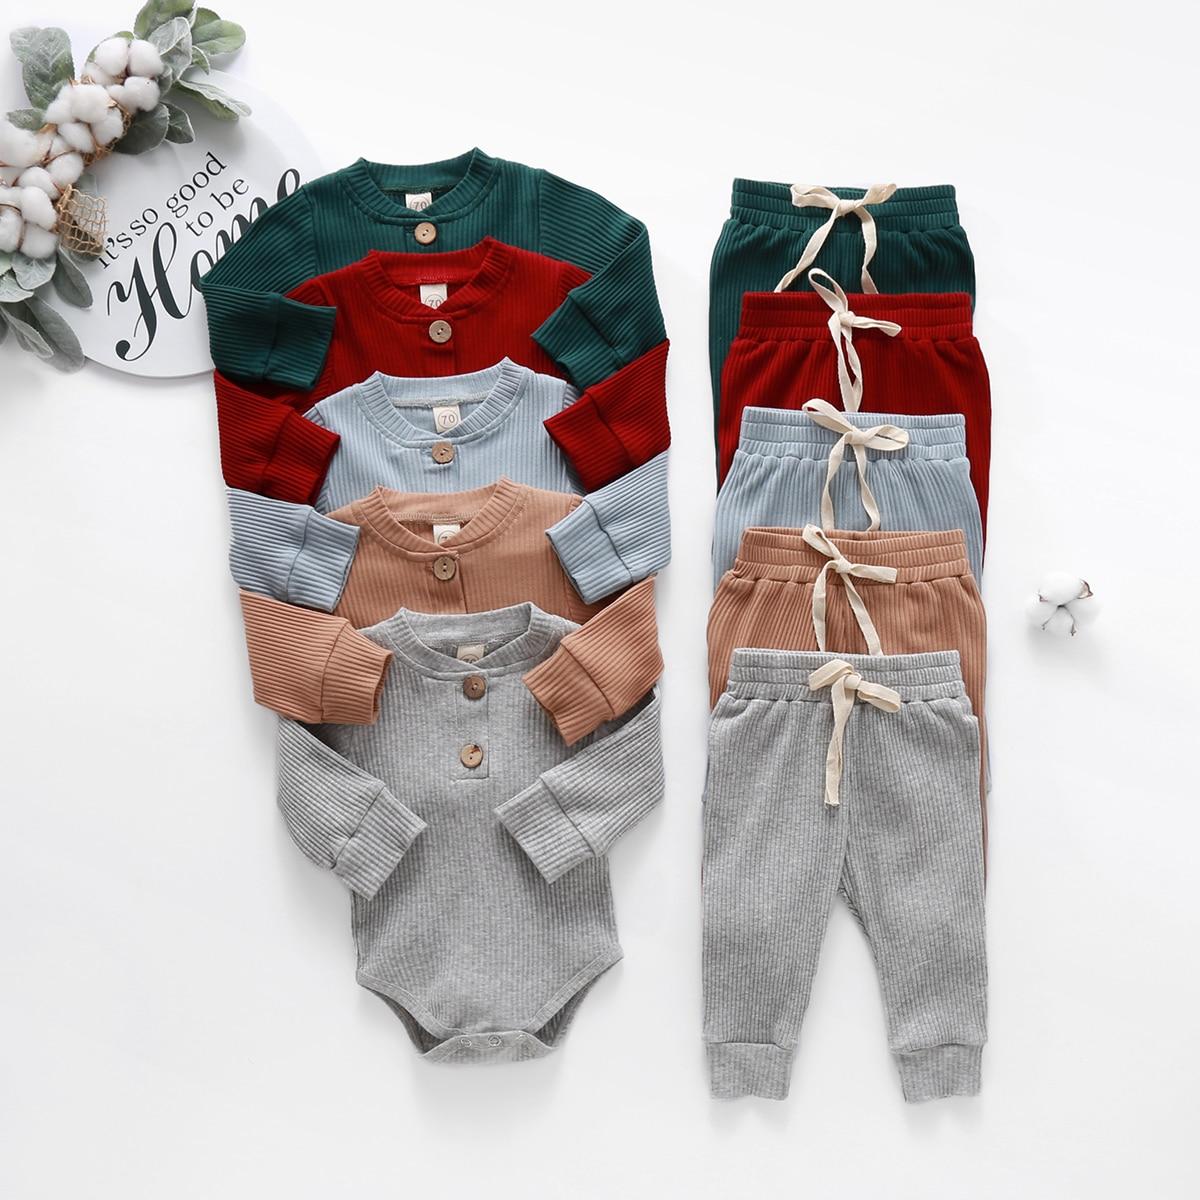 Infant Neugeborenen Baby Mädchen Jungen 2PCS Outfits 2020 Frühling Herbst Rippen Solide Langarm Bodys + Elastische Hosen Kleidung sets